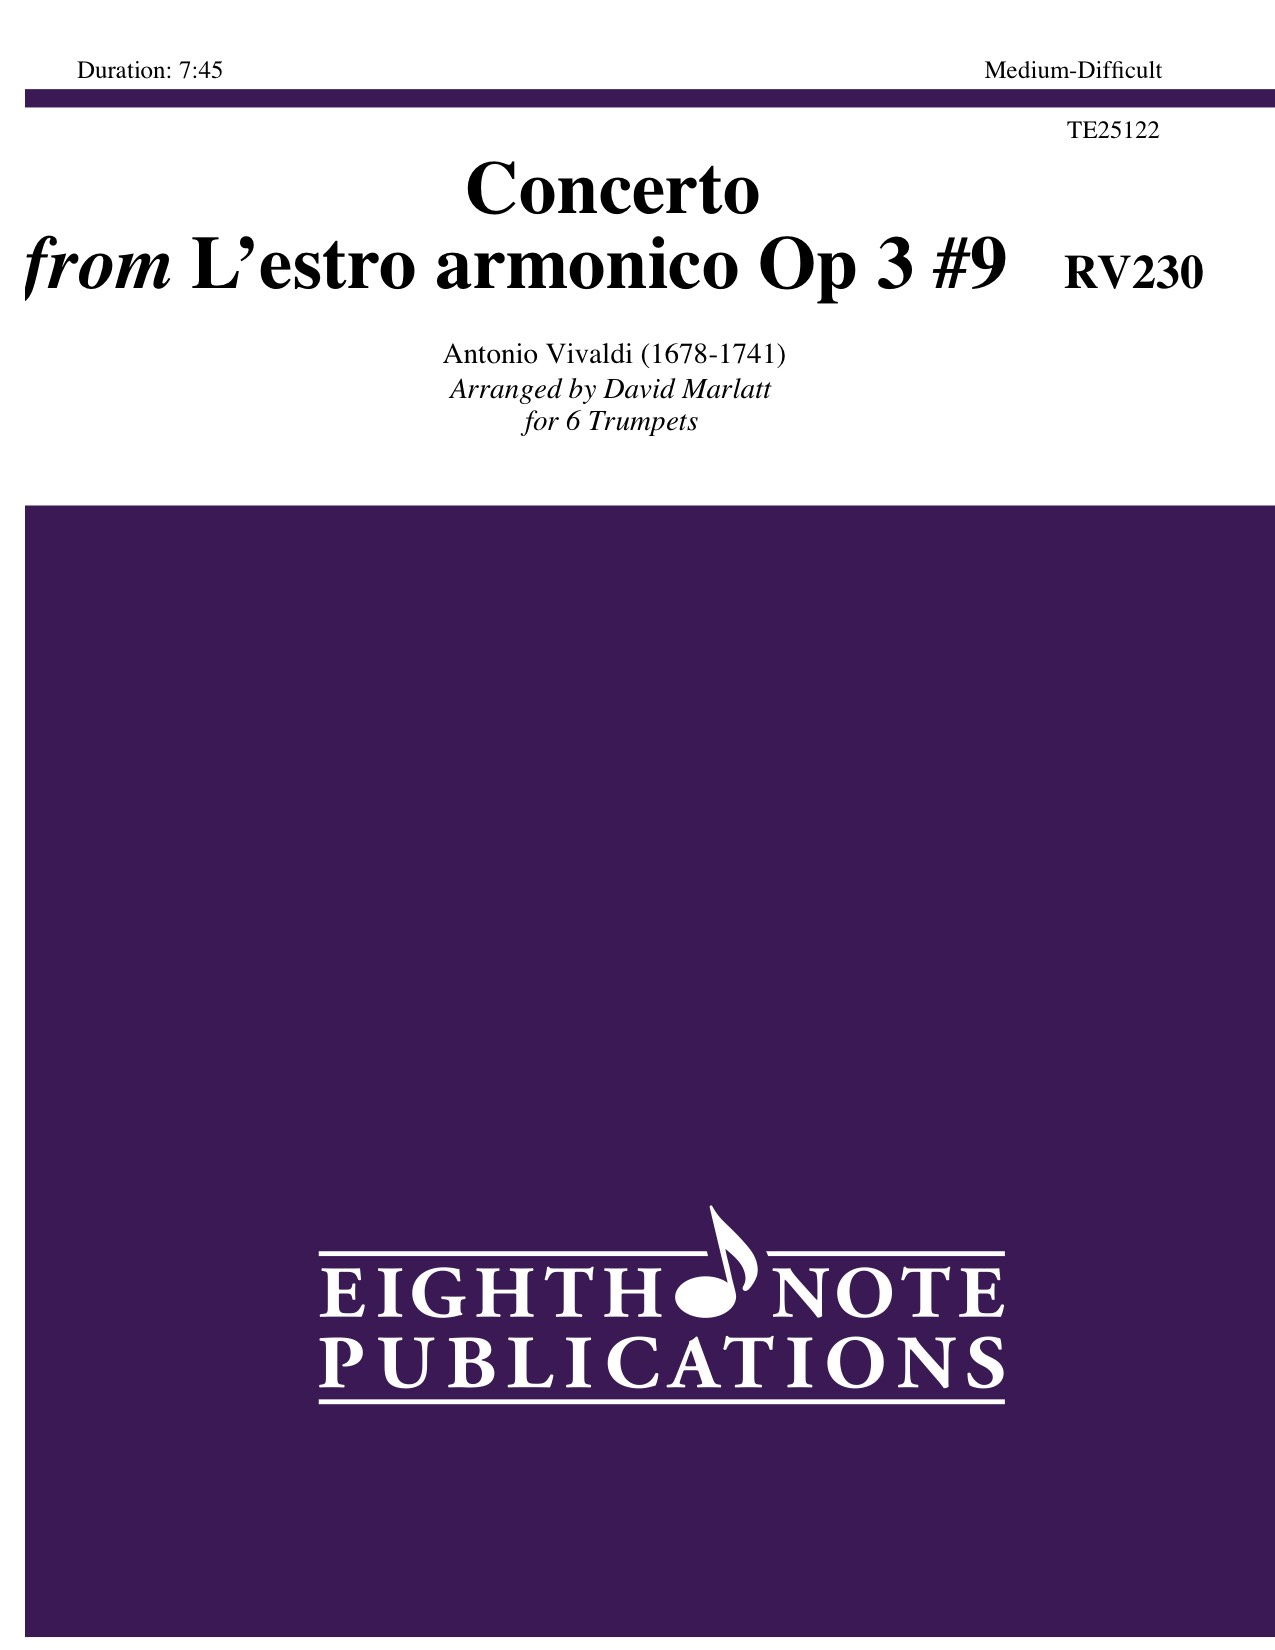 Concerto from Lestro armonico Op 3 #9  RV230  - Antonio Vivaldi